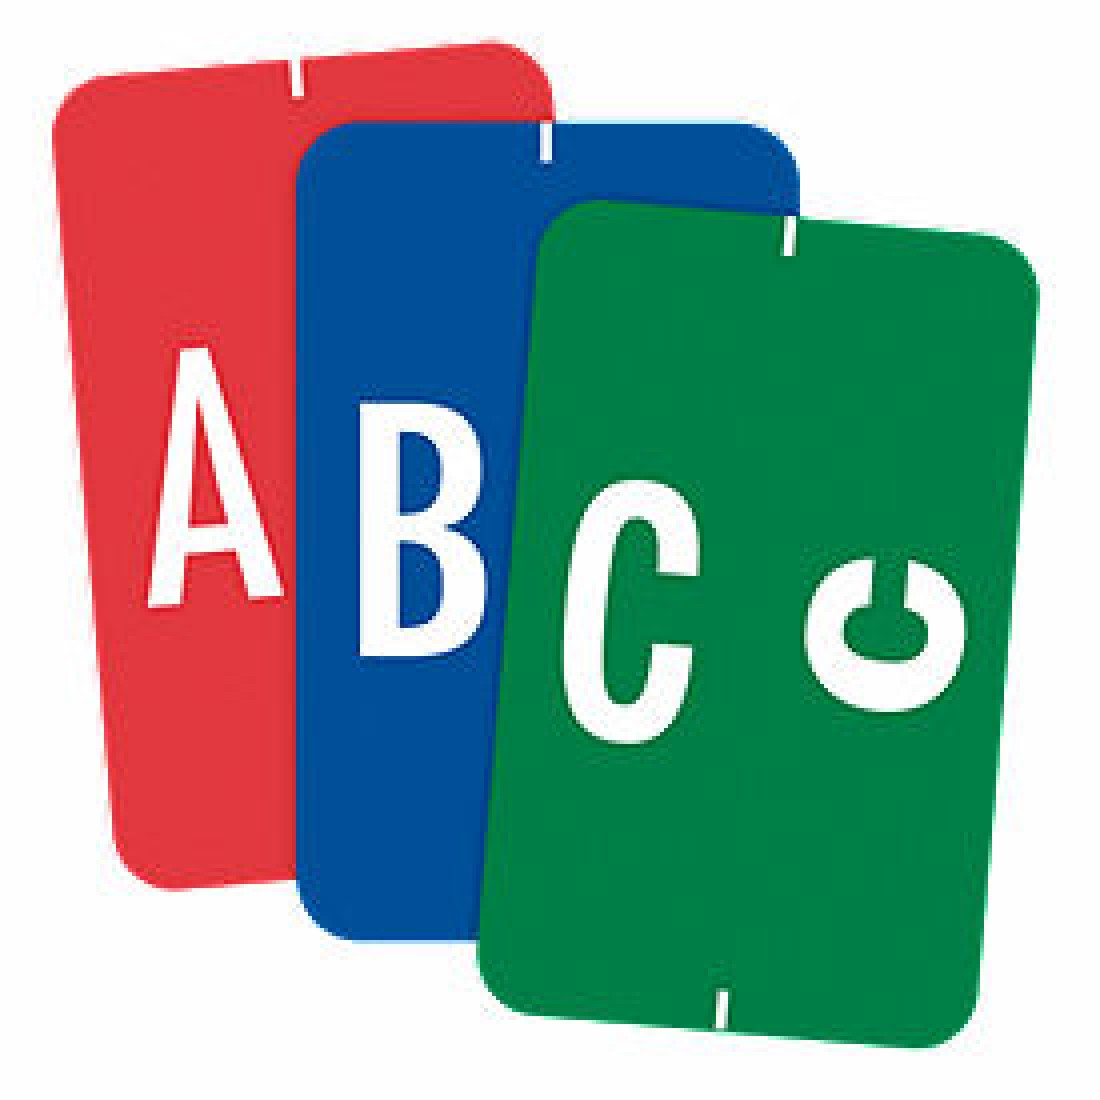 End Tab Compatible Alpha Labels (Item #M5529) - Business Checks Supplies  - Business Checks